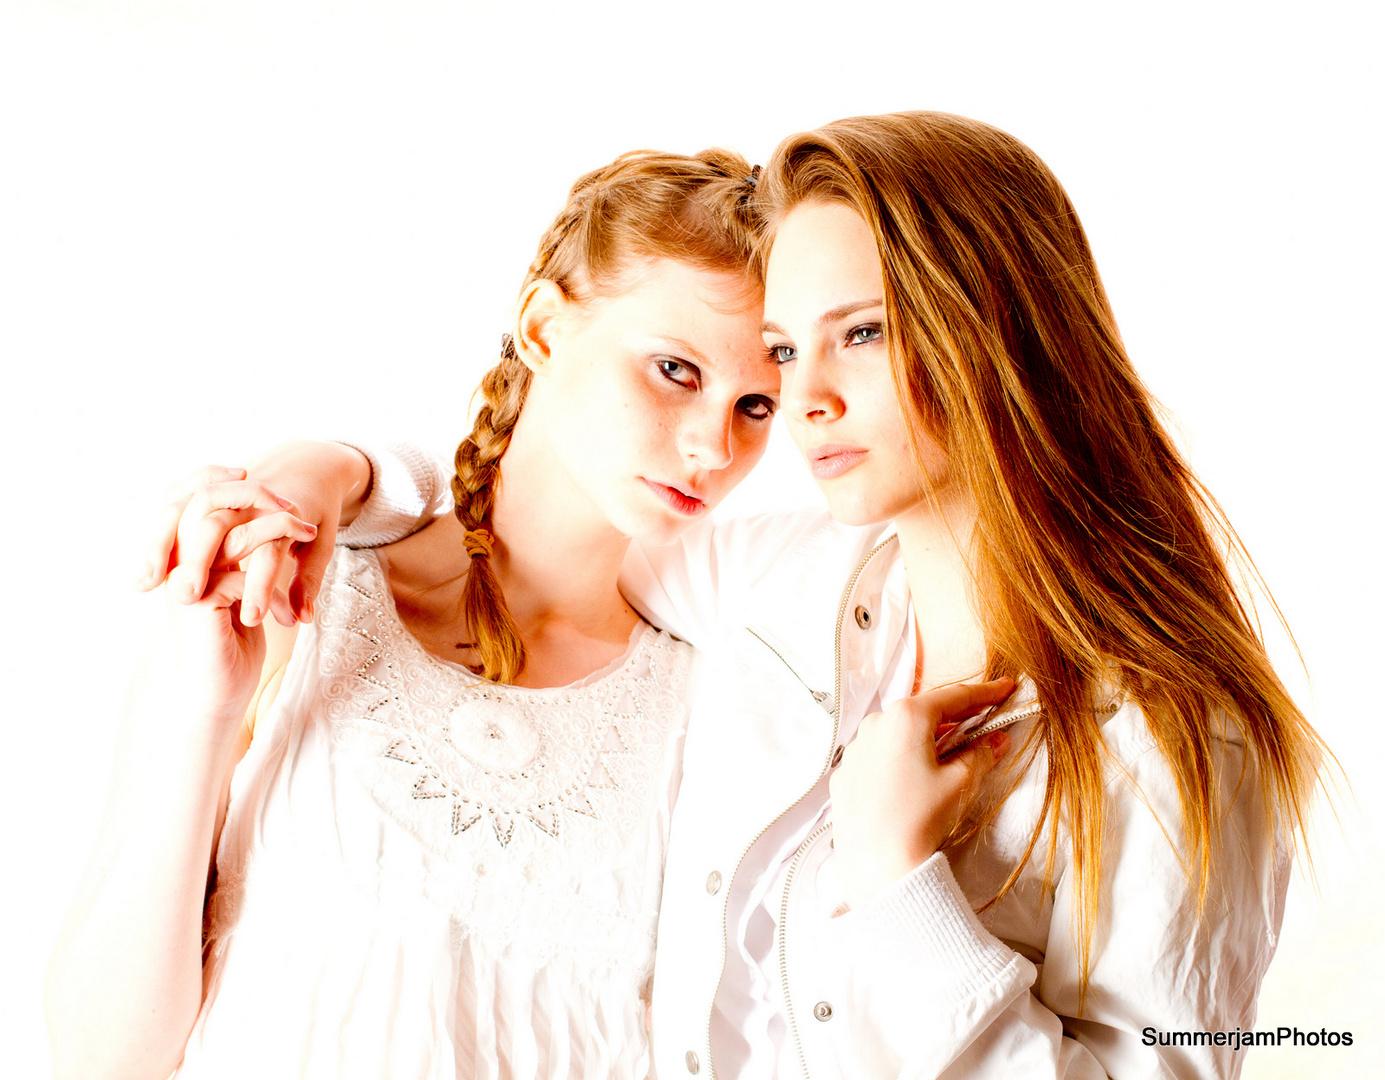 Maia + Susanne